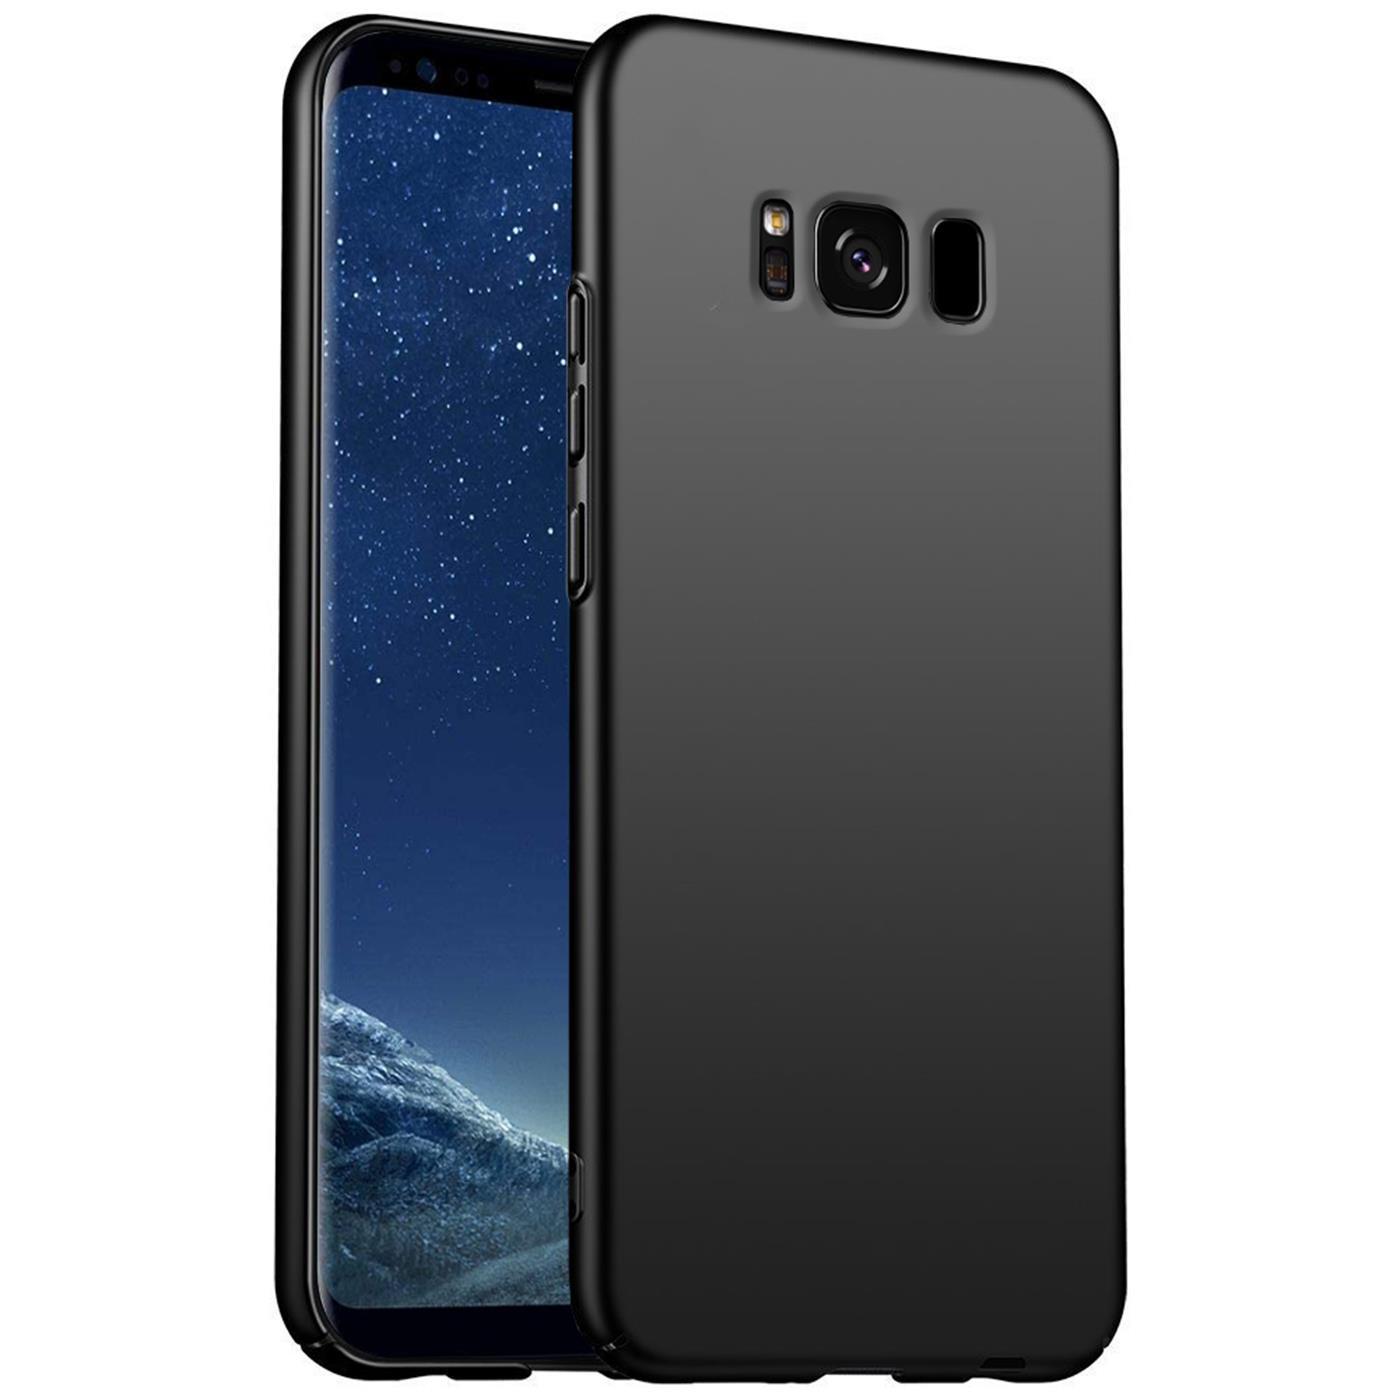 Hard-Back-Case-Cover-Samsung-Galaxy-s4-duenn-Cover-Slim-Shockproof-Rugged Indexbild 6